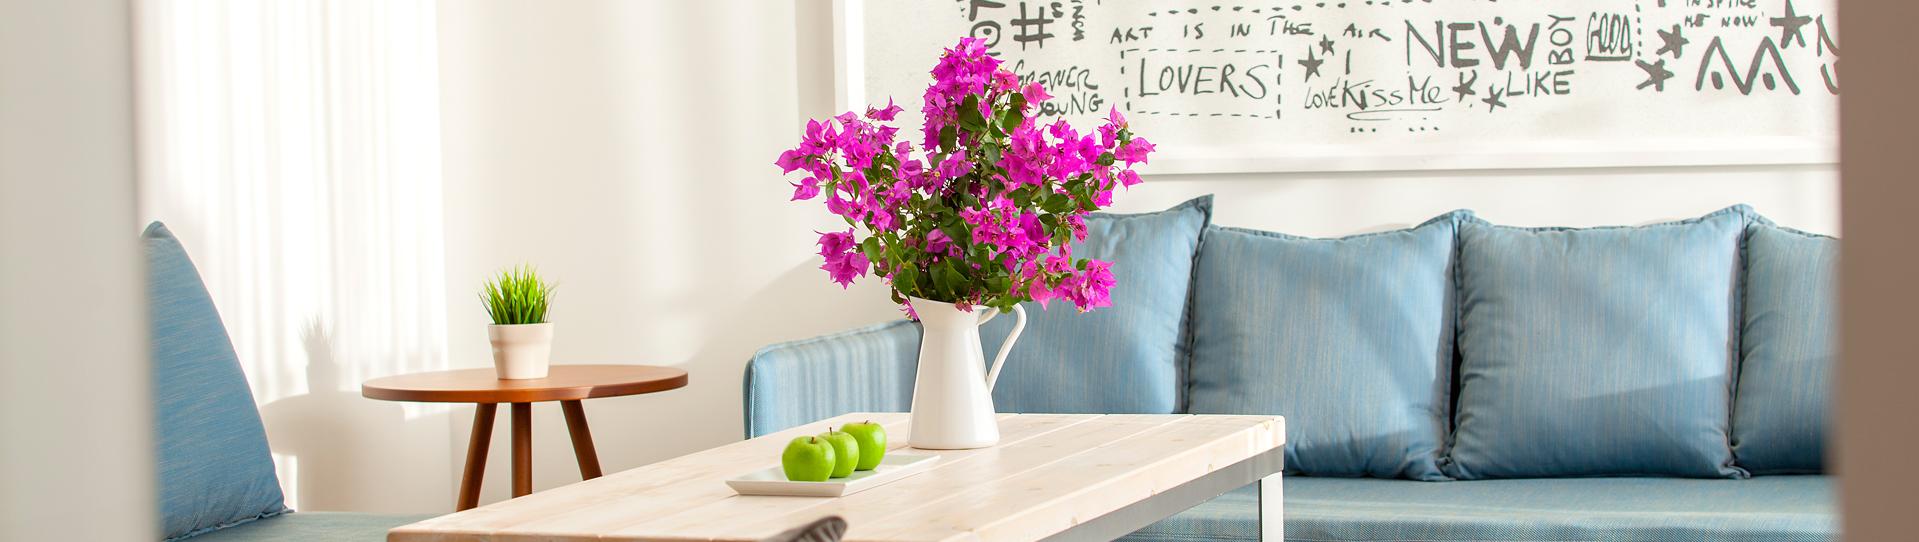 Astounding Aegean Two Bedroom Suite Aliathon Resort Machost Co Dining Chair Design Ideas Machostcouk